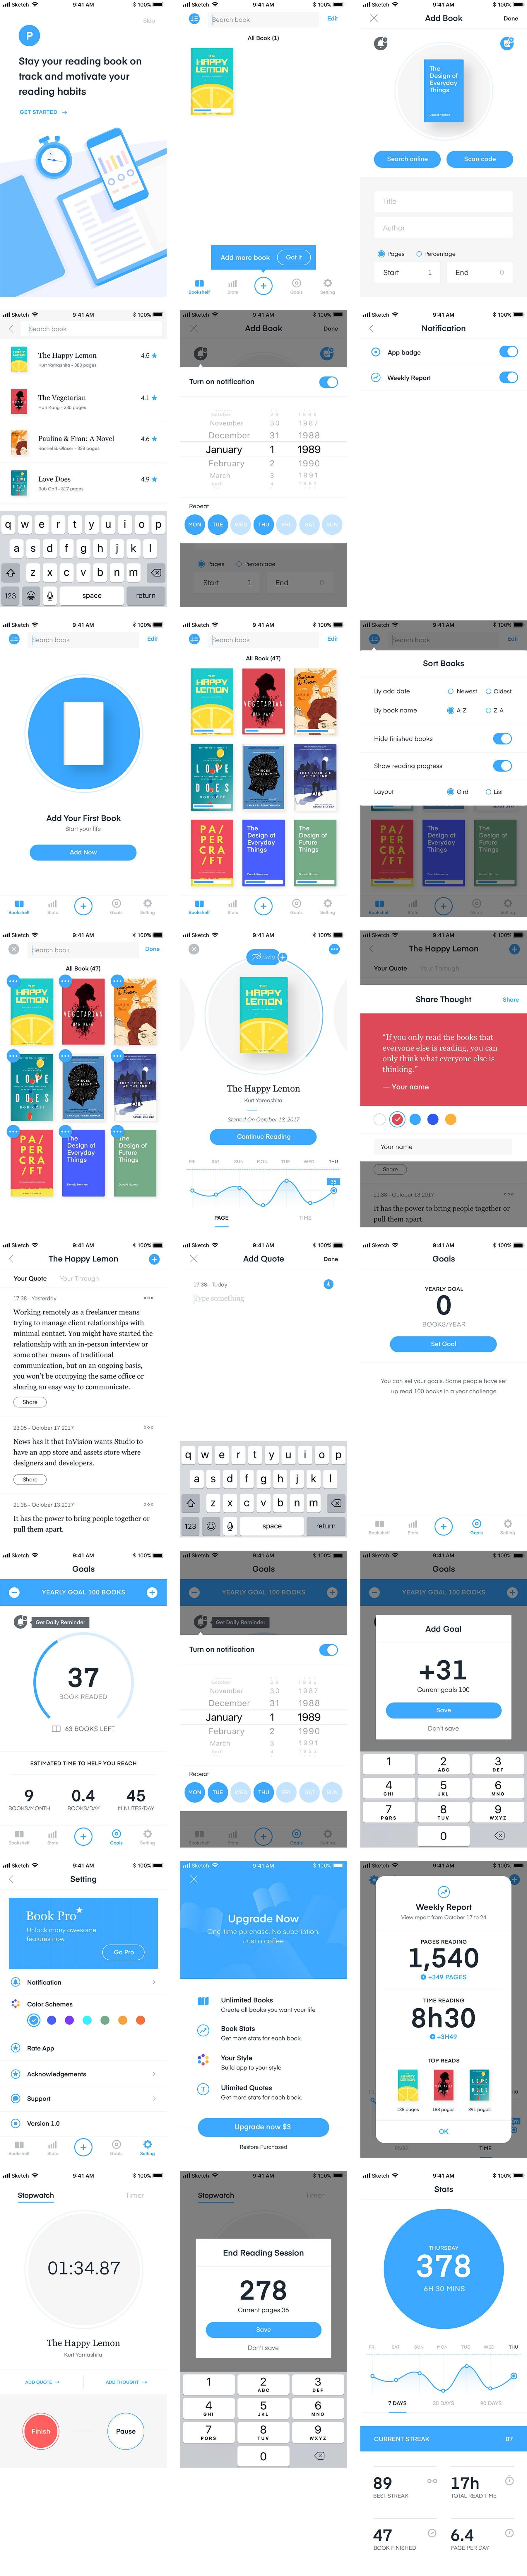 Policia阅读类 UI界面设计主题包.sketch素材下载 主题包-第1张